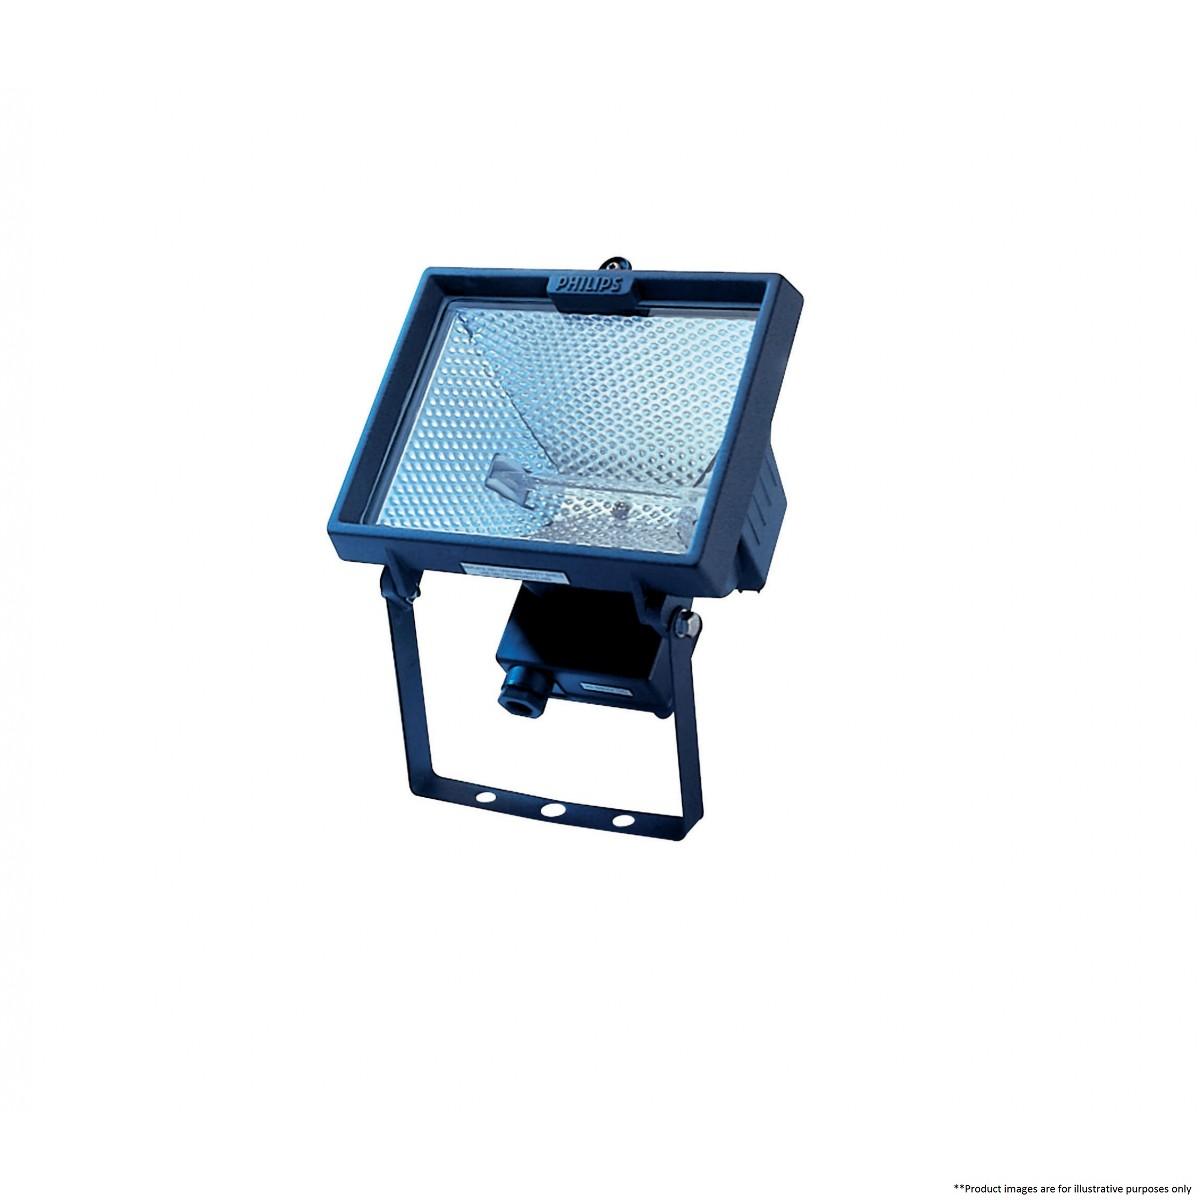 philips qvf137 hal tdl1000w k 240v gr floodlights lightings by rh omseshop com Philips User Guides Philips TV User Manual